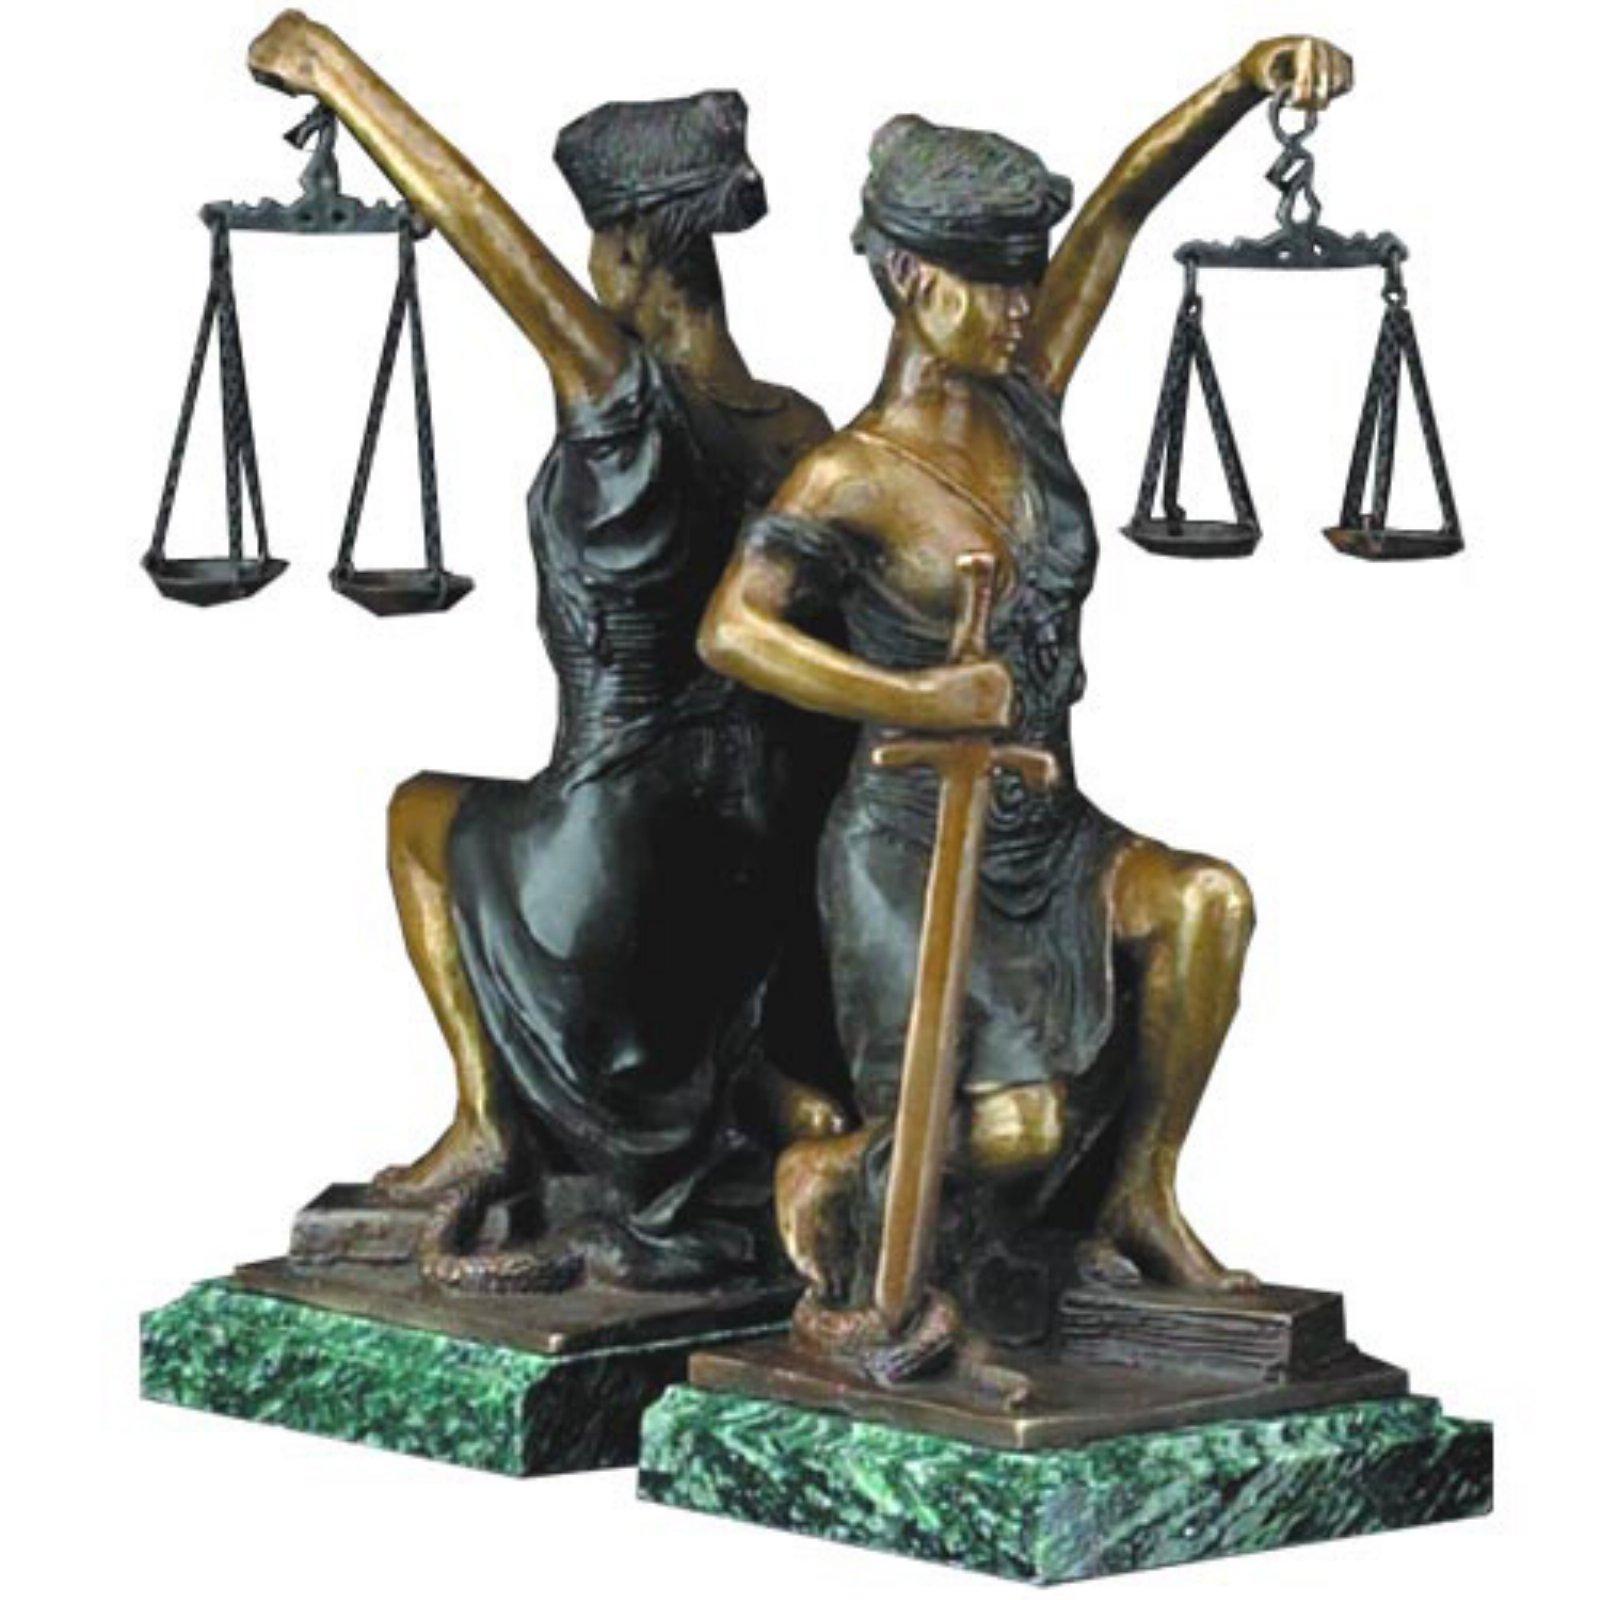 Bey Berk Kneeling Lady Justice Bookends